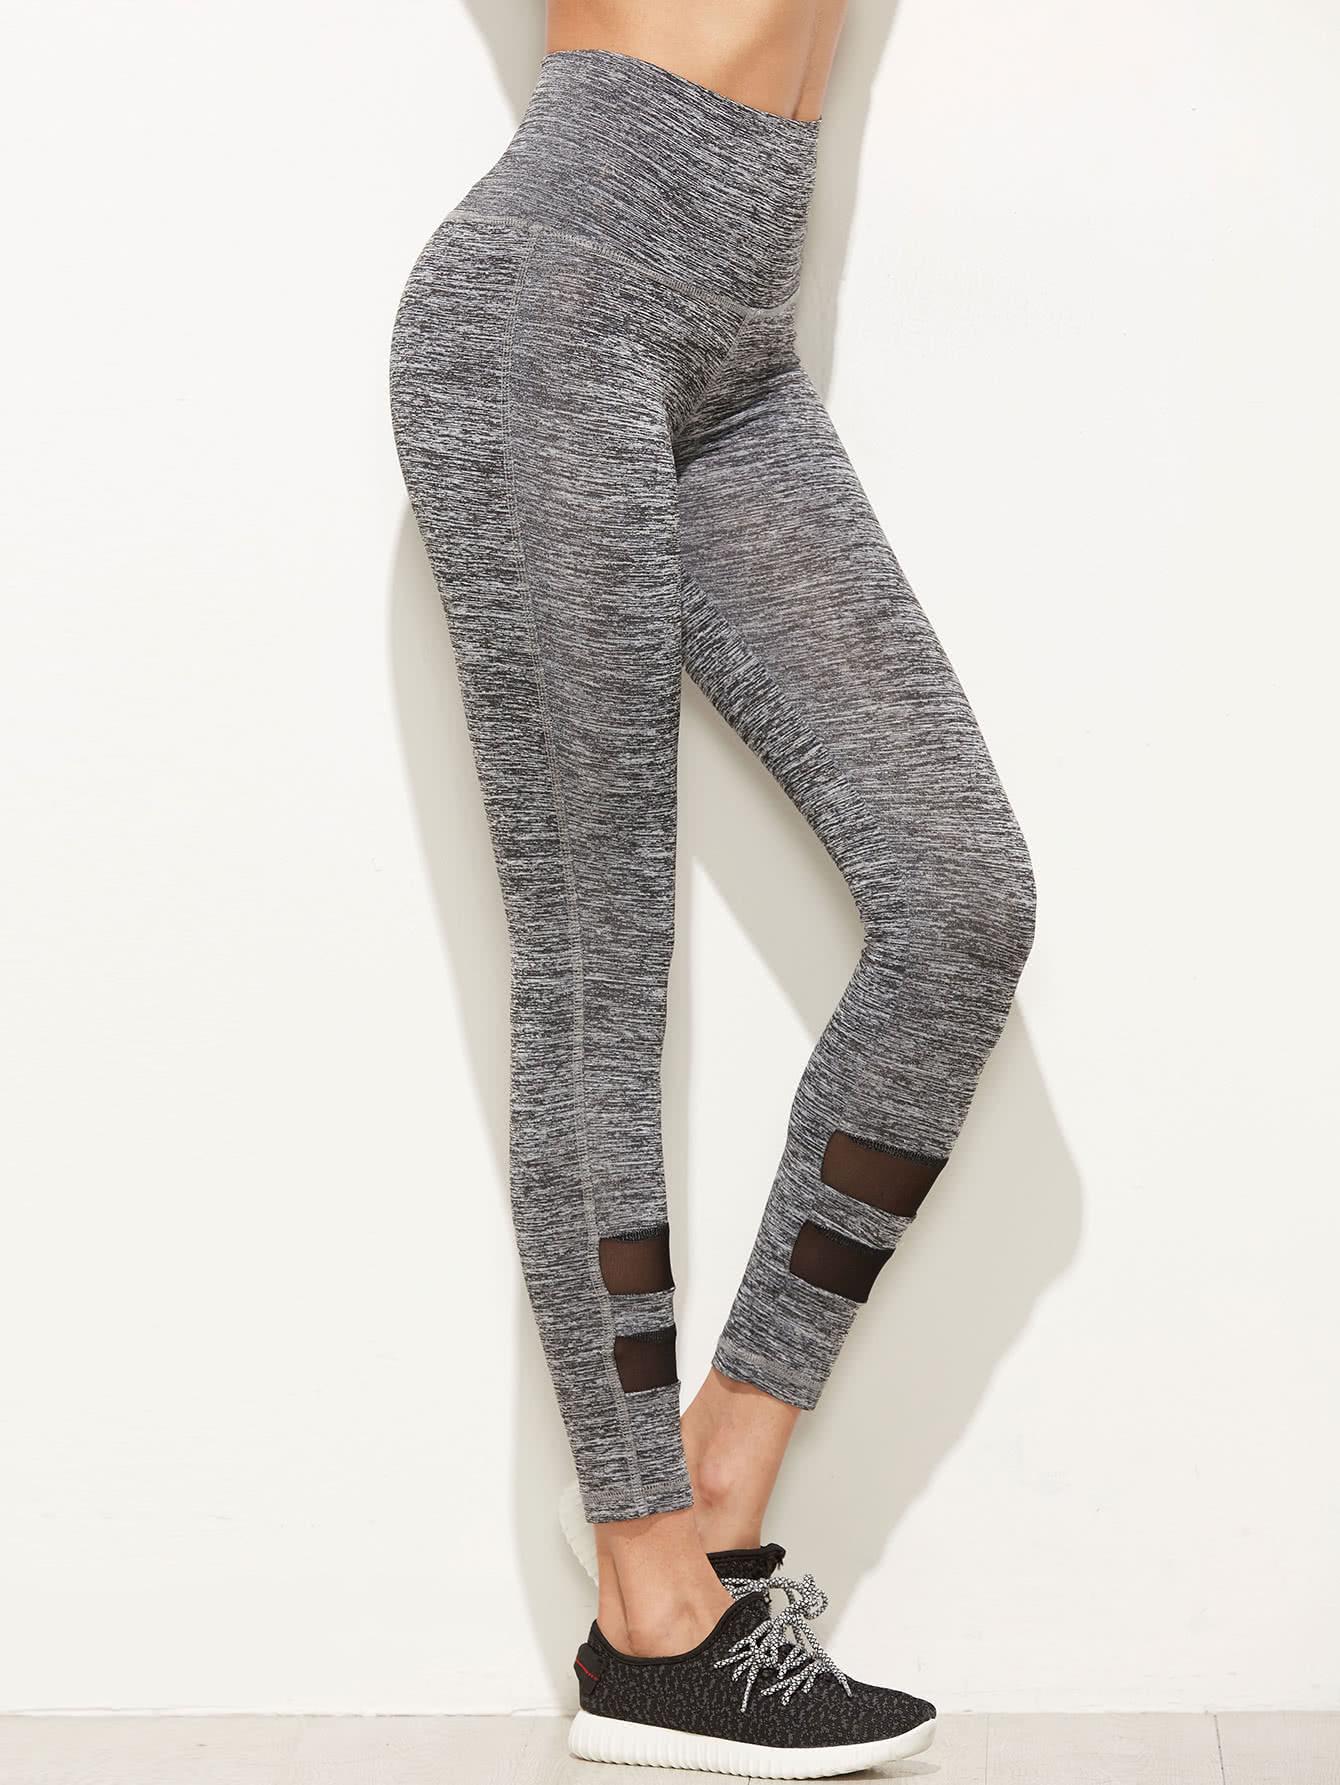 Grey Marled High Waist Leggings With Mesh Panel Detail leggings161118704